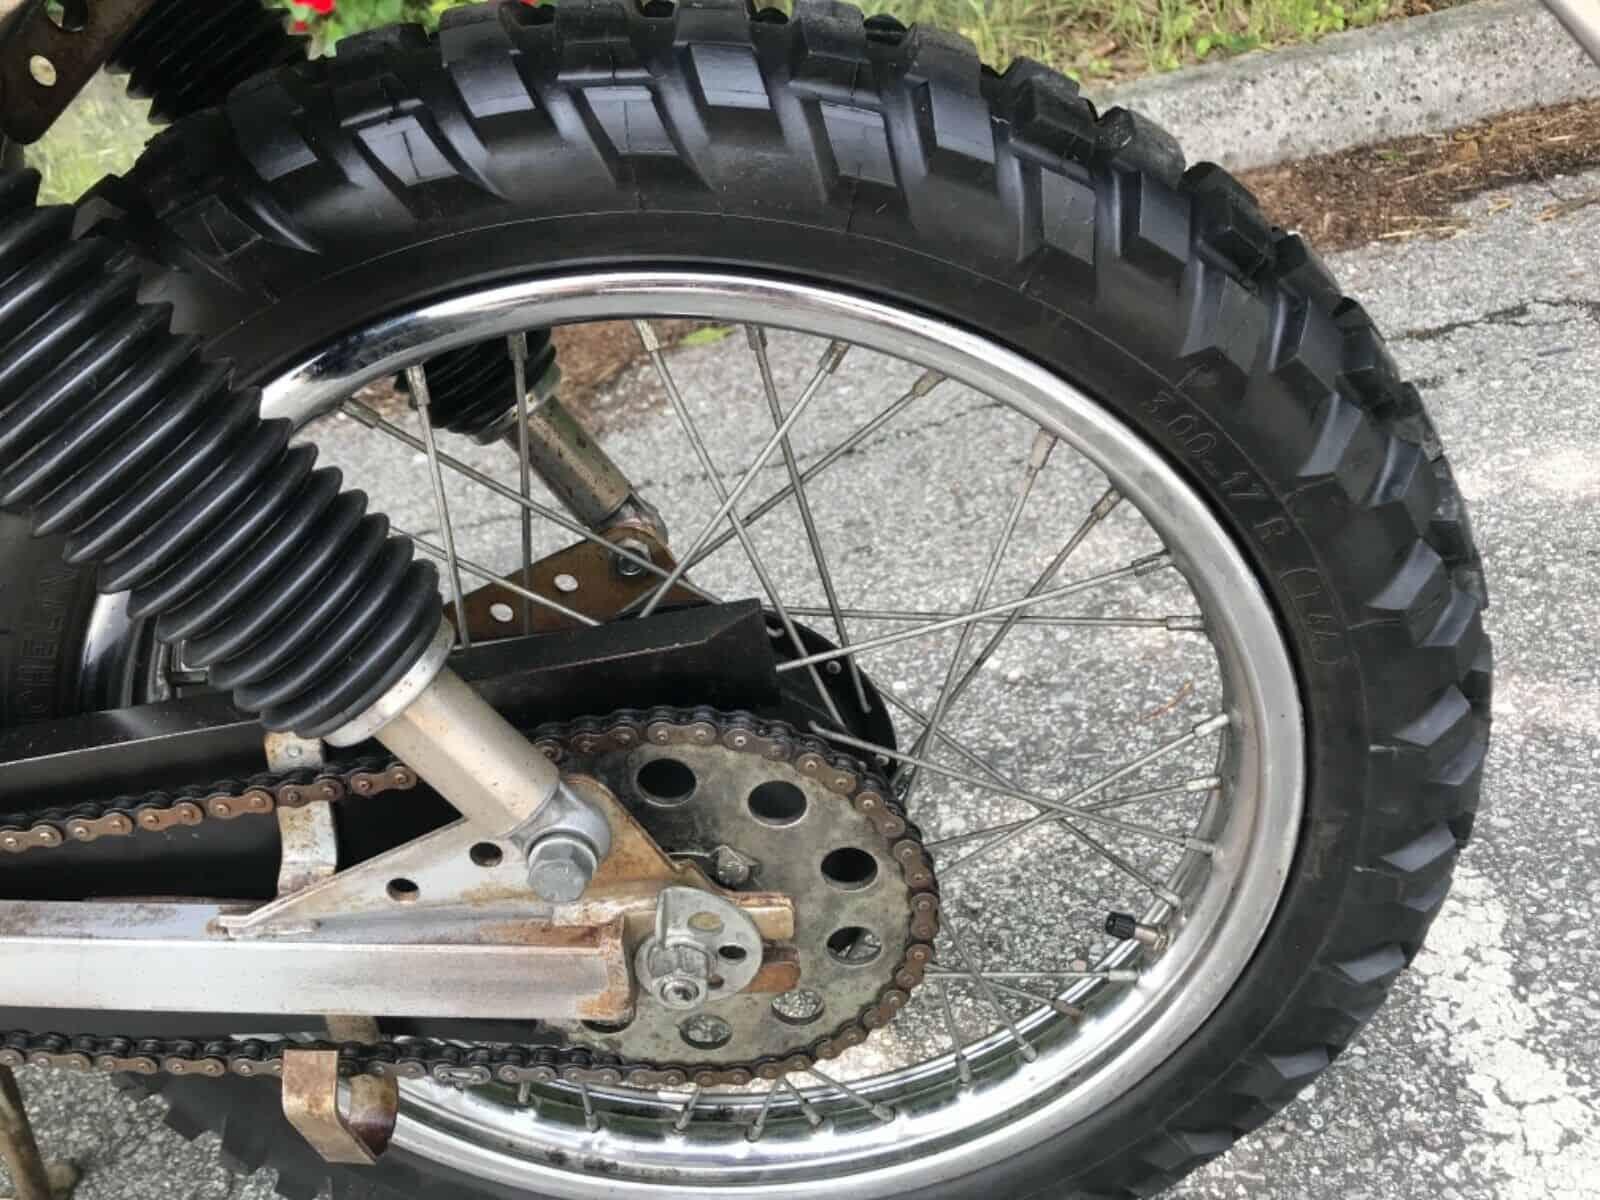 MALANCA COUNTRY CROSS 50cc 1975